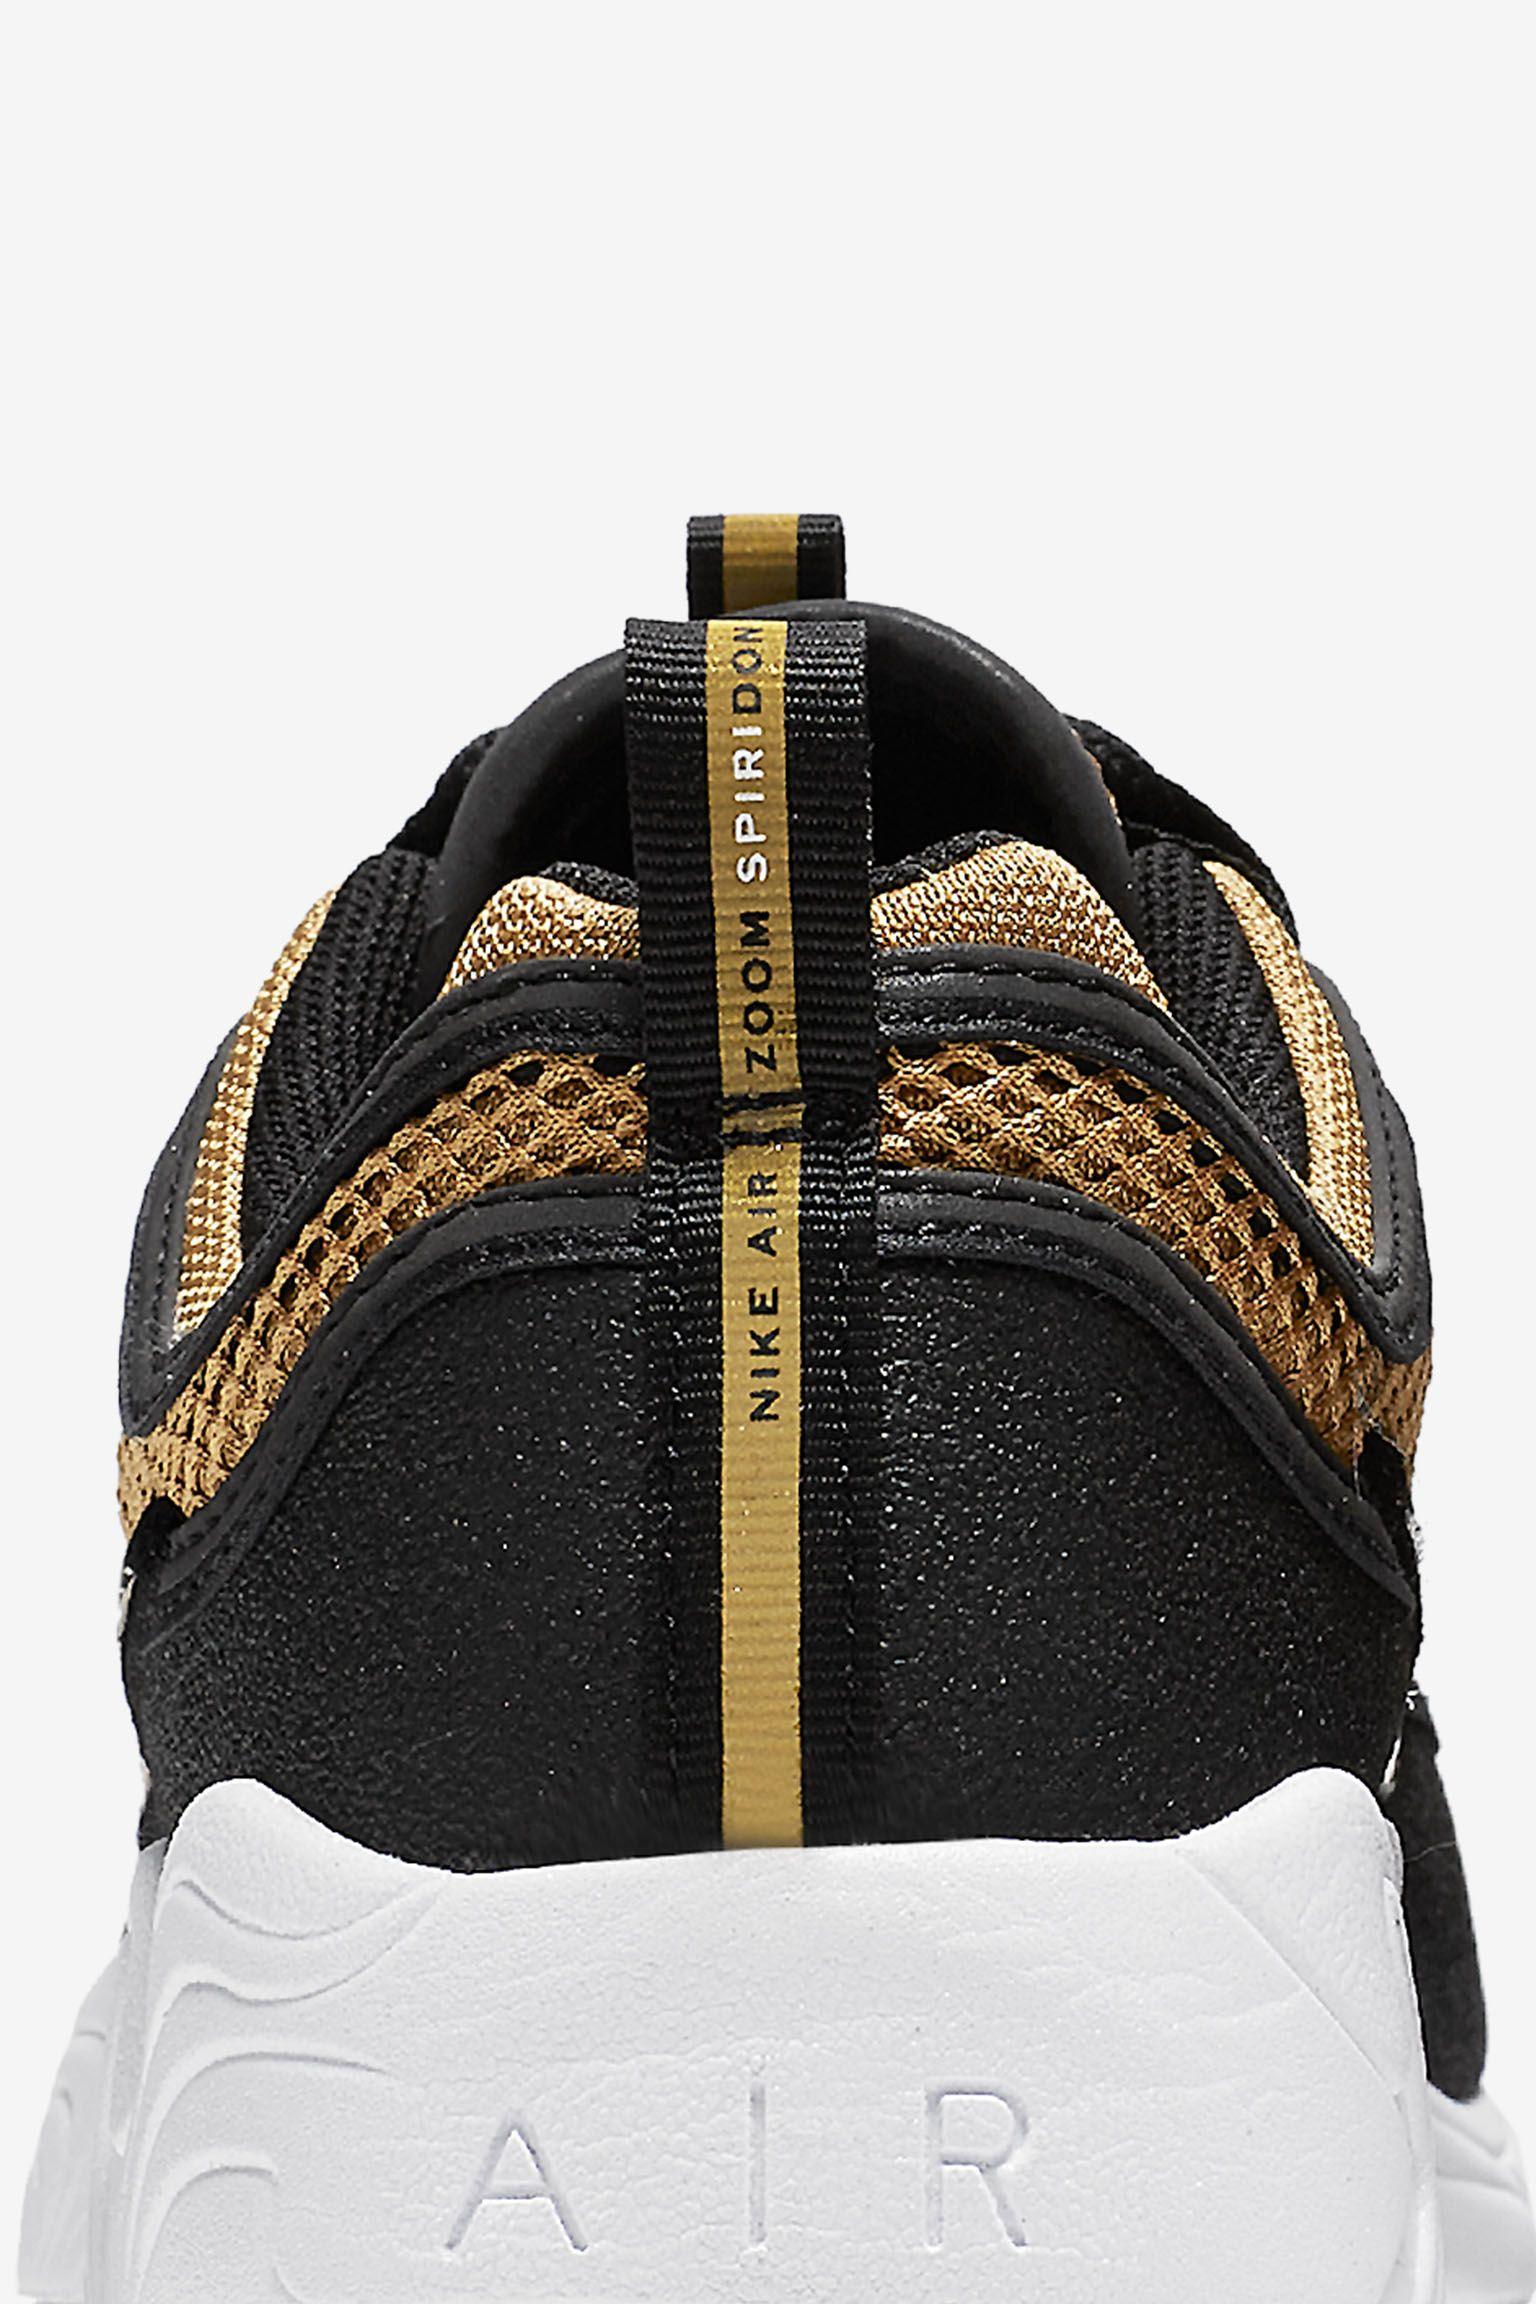 Nike Air Zoom Spiridon 'Golden Shine'